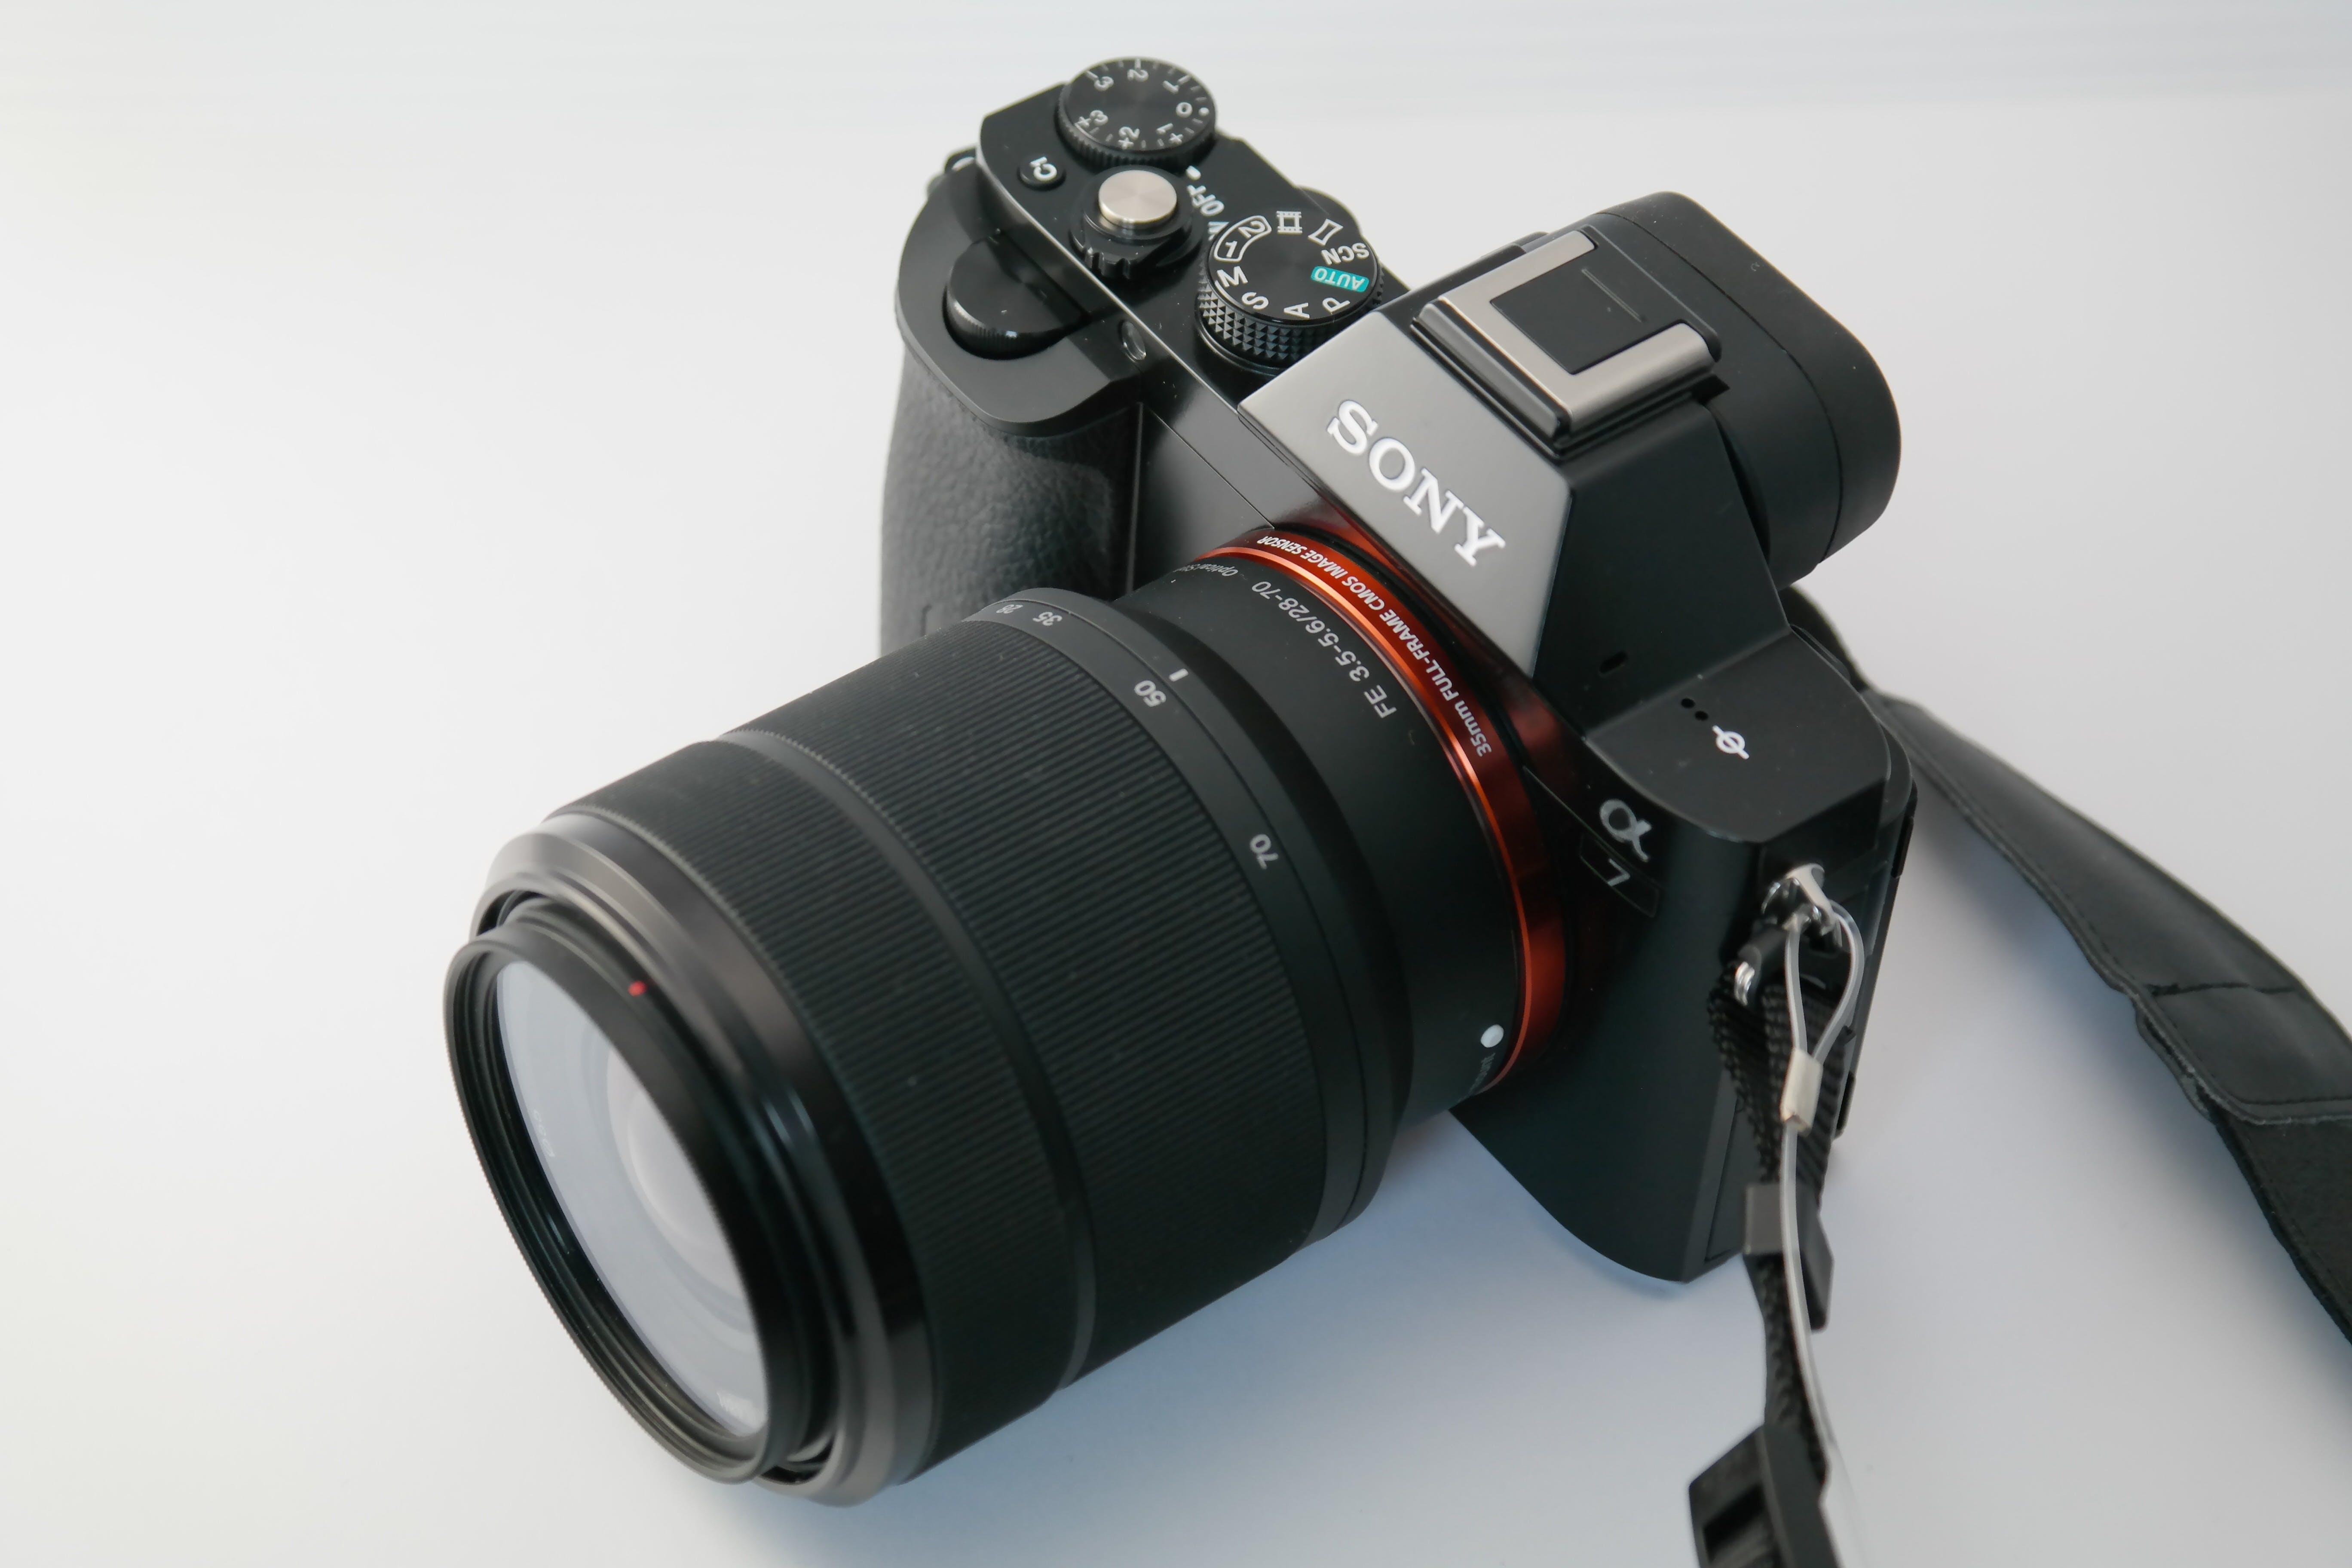 Black Sony Dslr Camera on White Surface